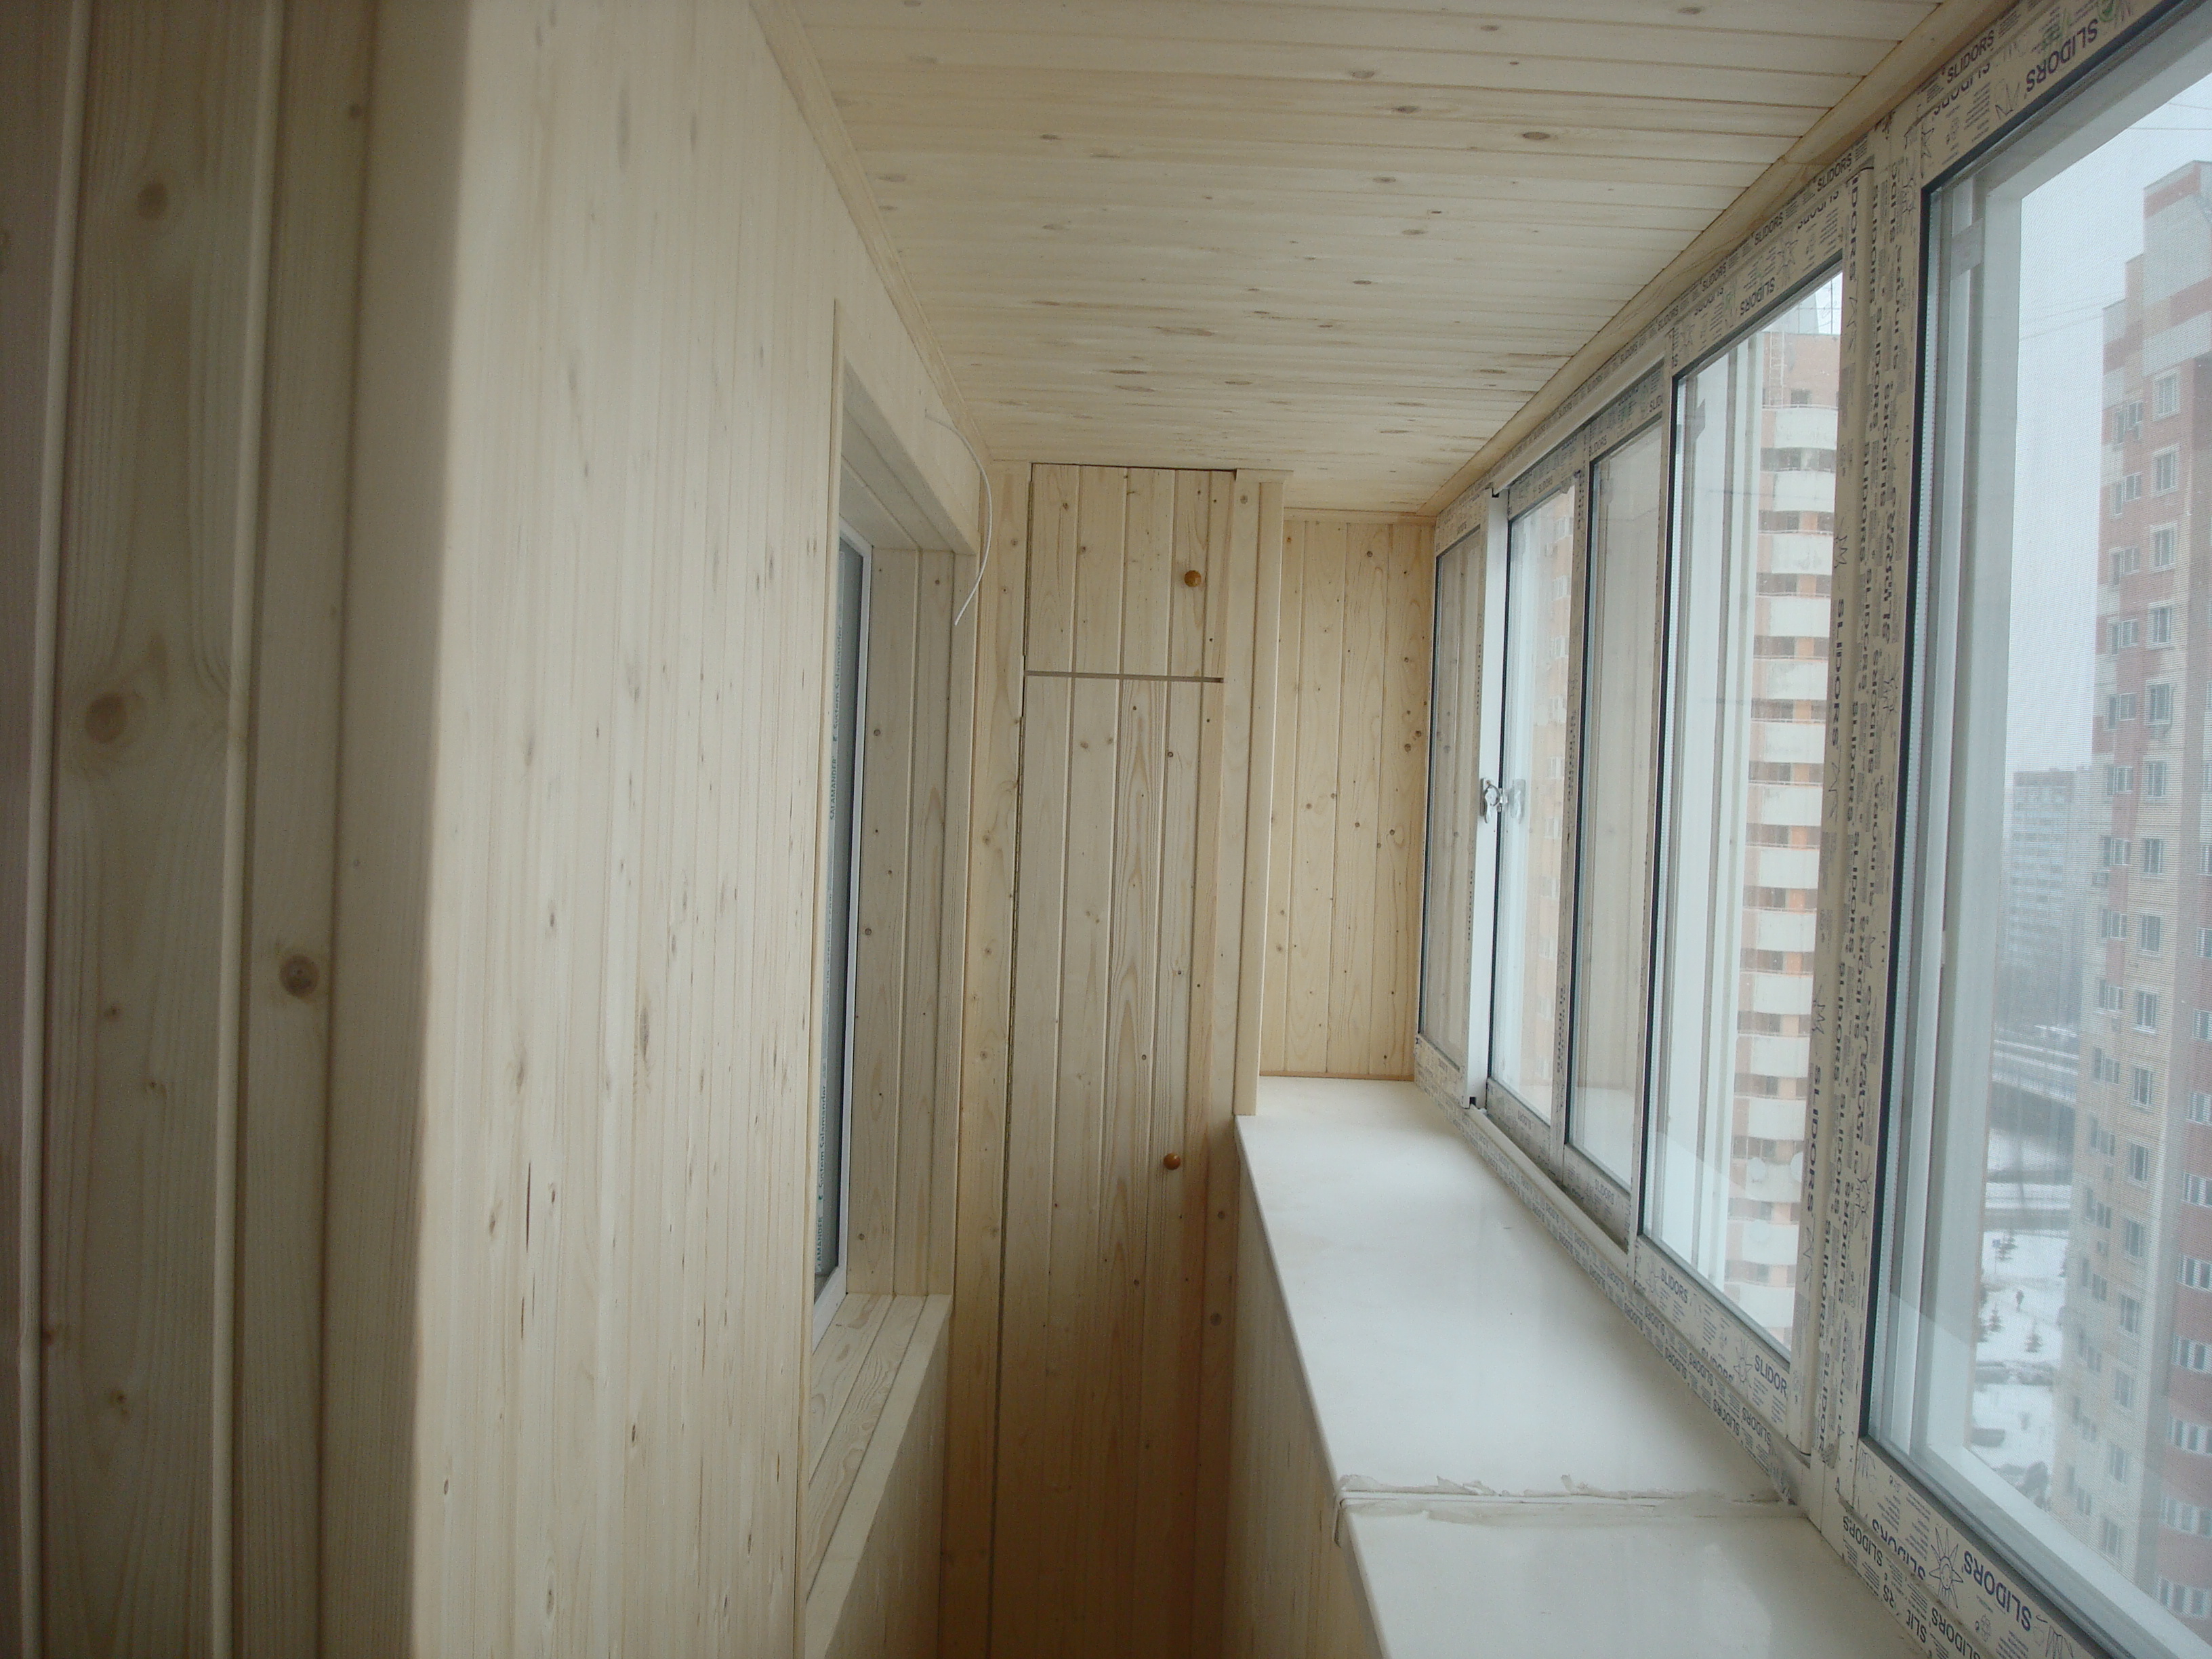 Благоустройство балконов, лоджий, дач. - отделка балкона.....